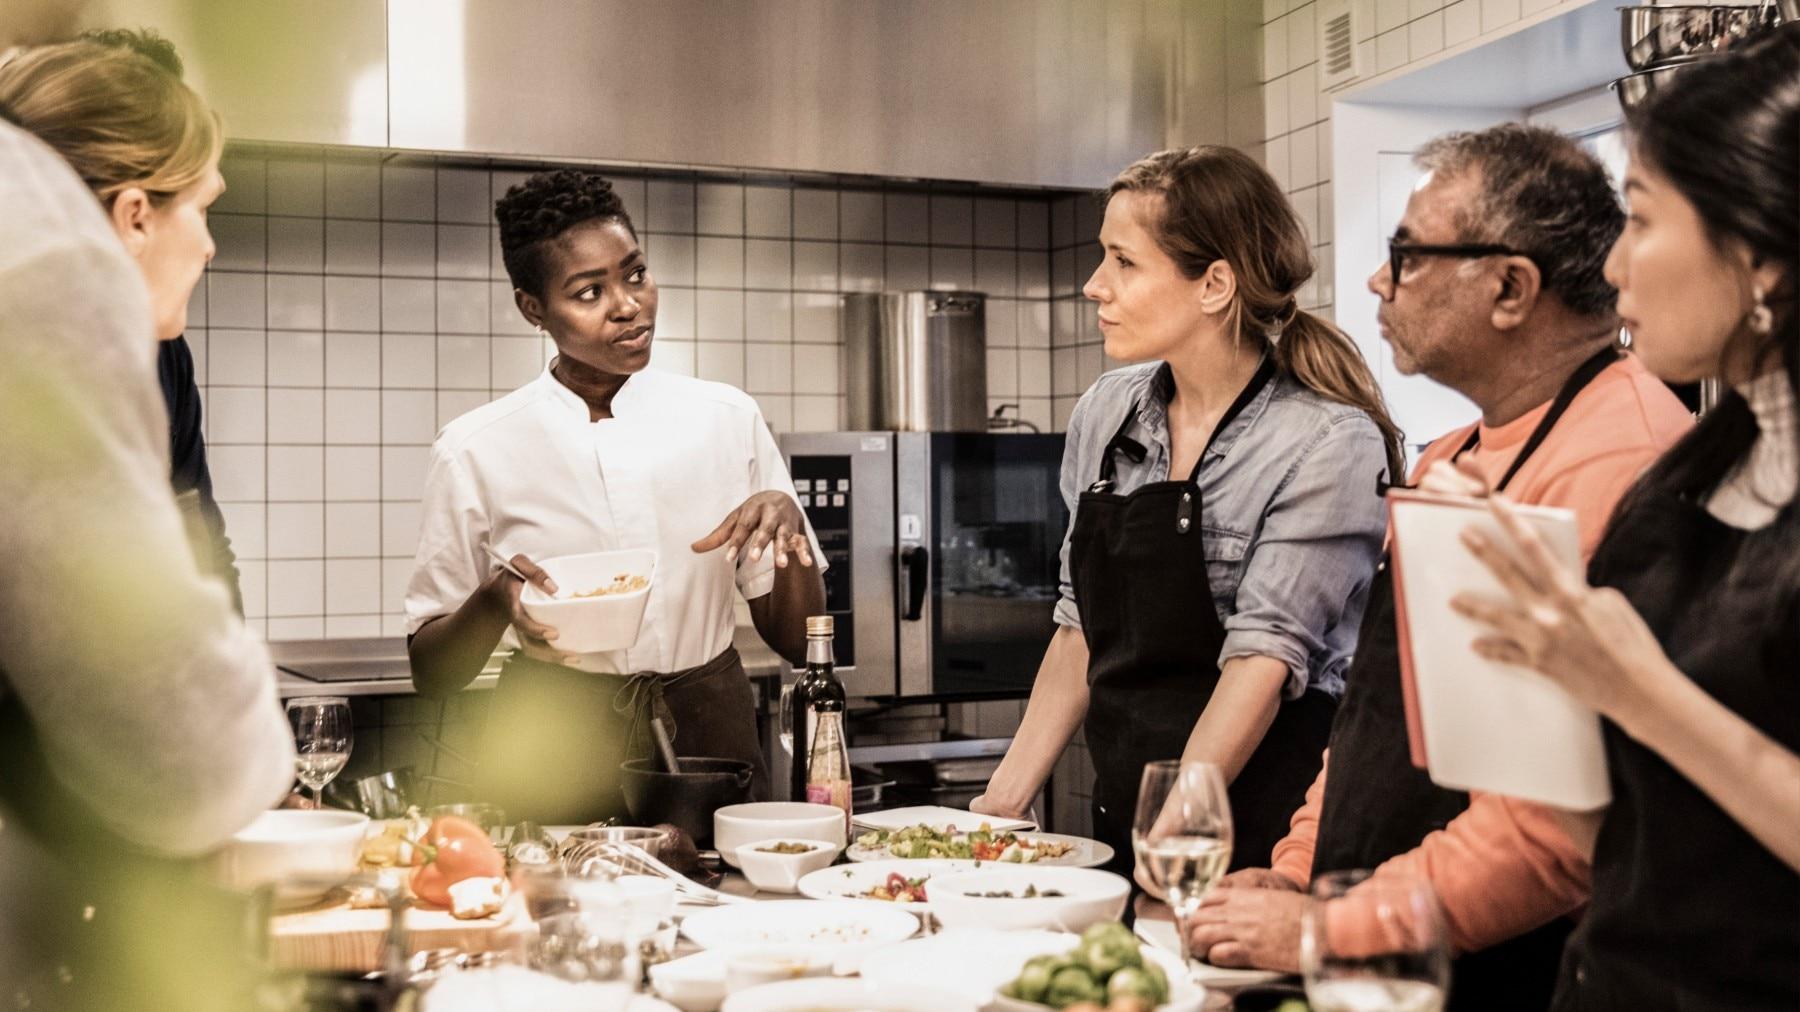 kitchen staff, cooking class, TAFE